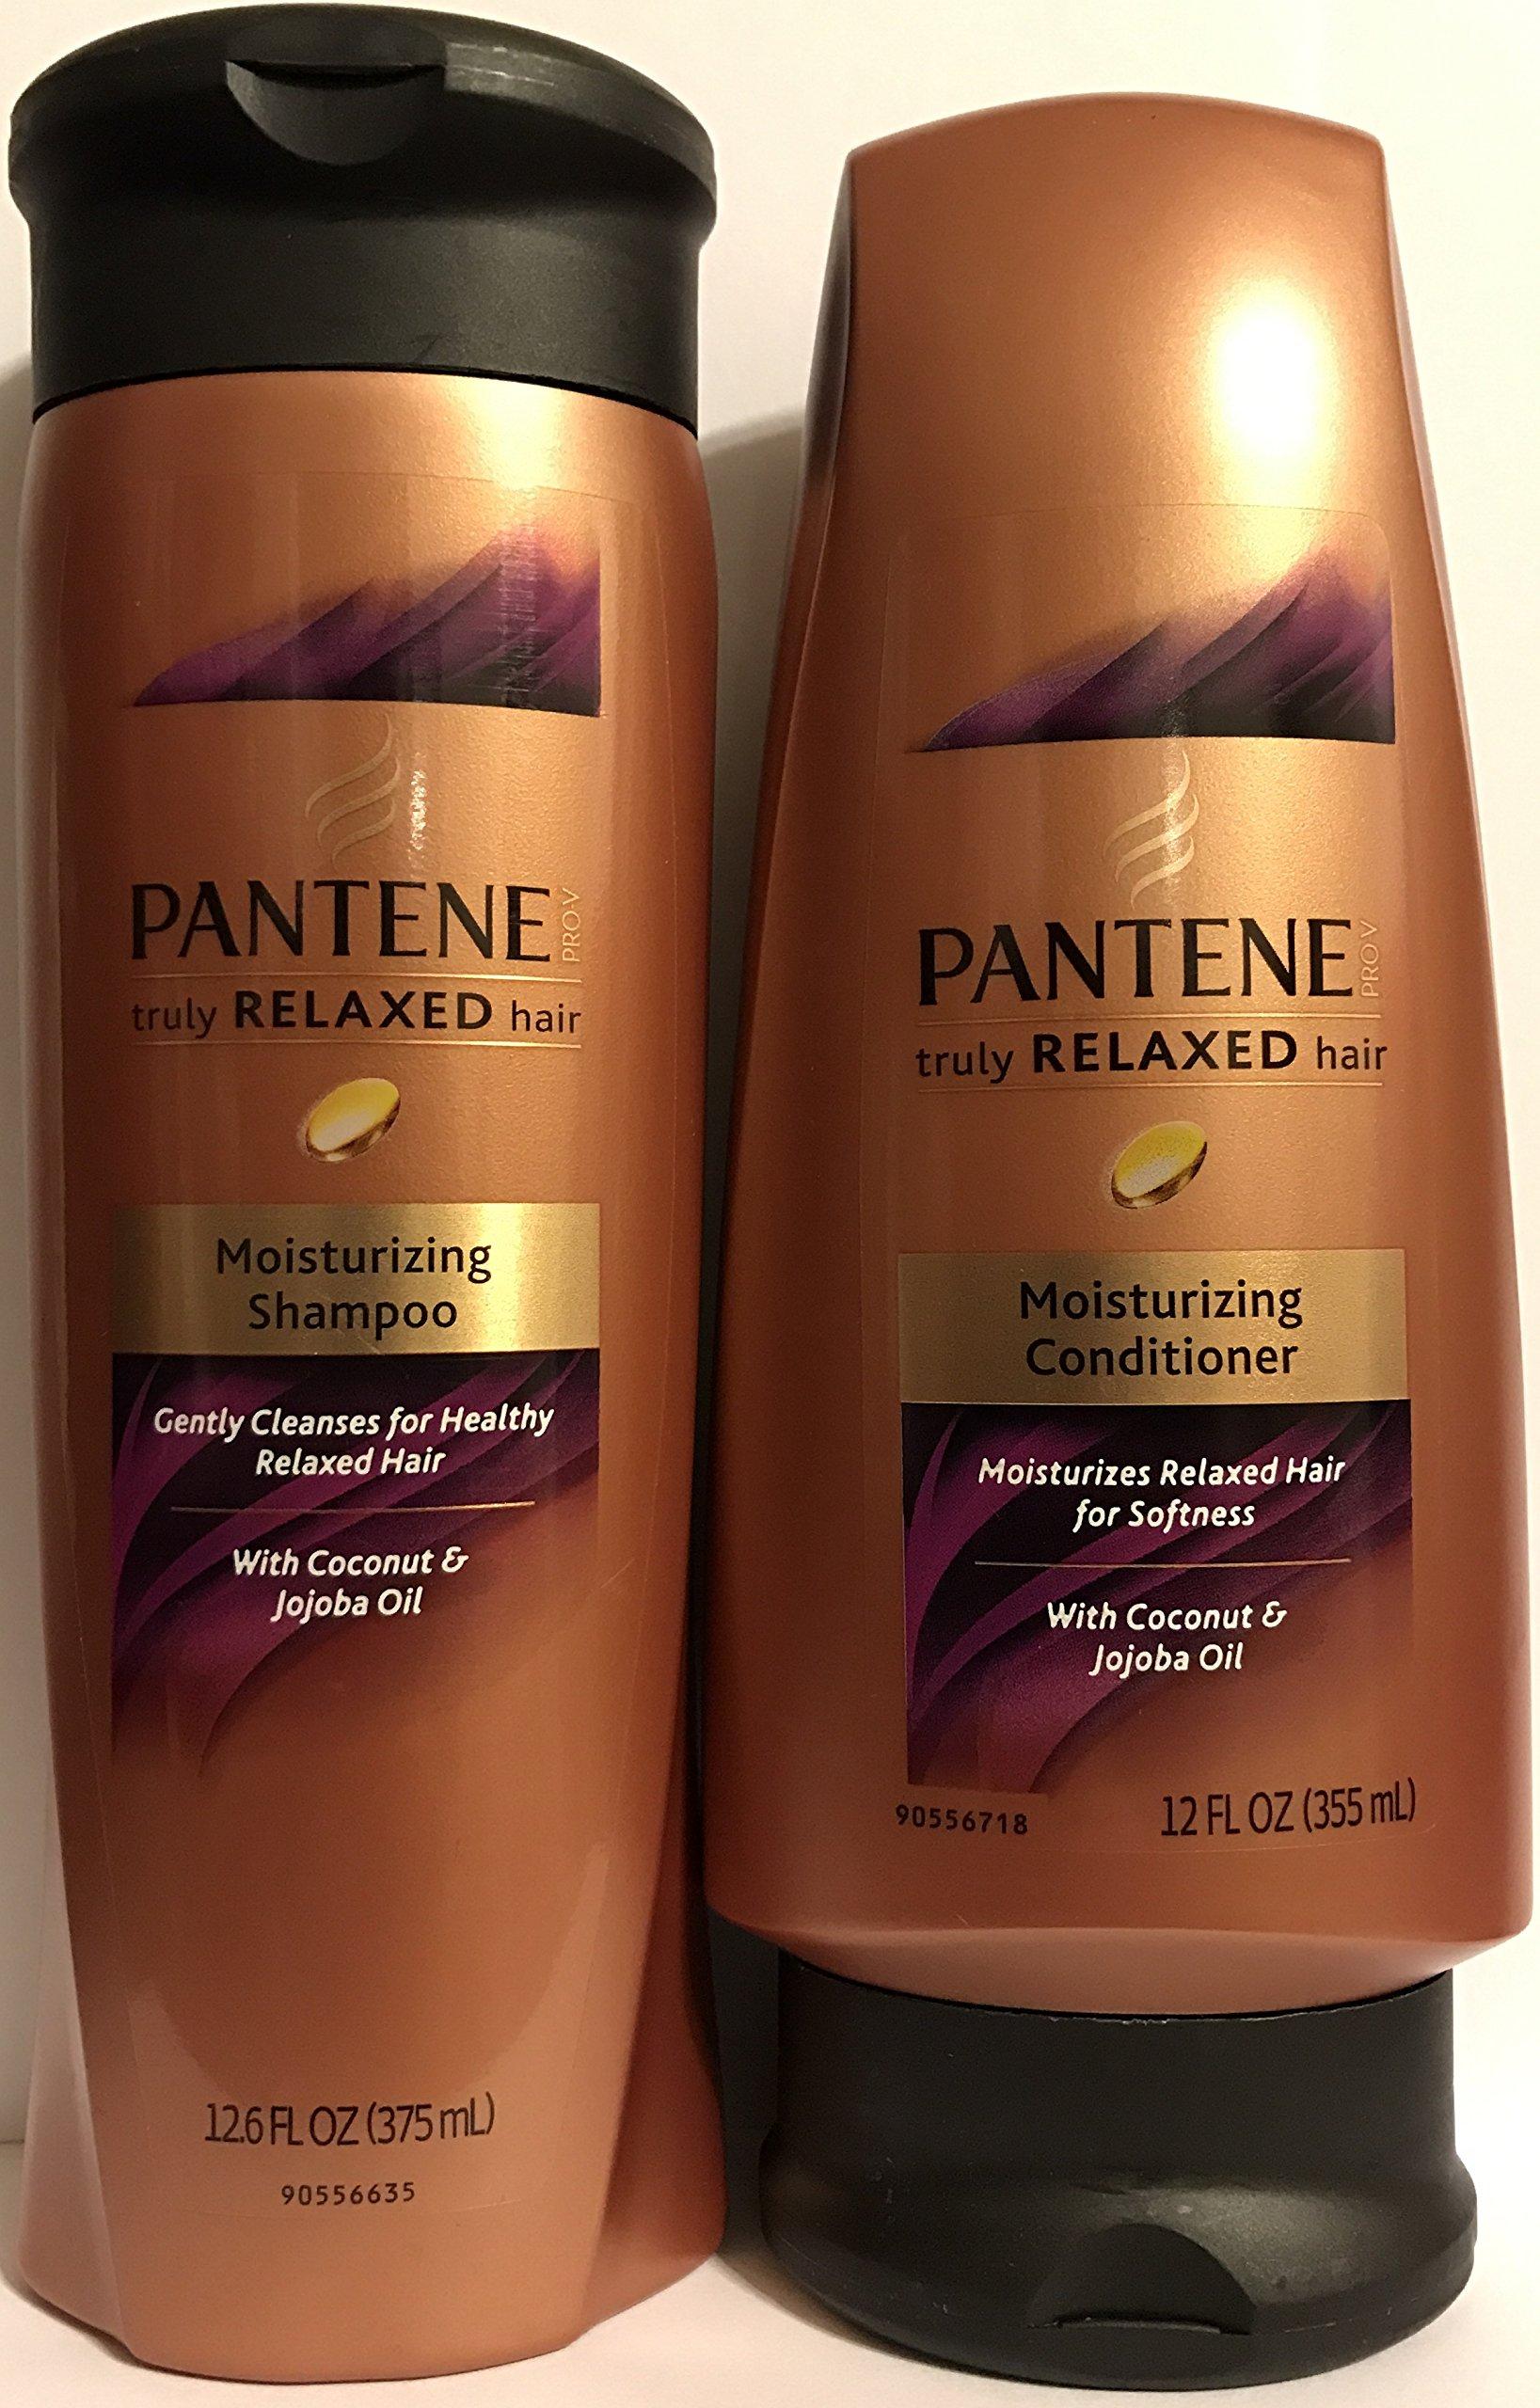 Pantene Truly Relaxed Hair - Moisturizing Shampoo & Conditioner Set - Net Wt. 12.6 FL OZ (Shampoo) & Net Wt. 12 FL OZ (Conditioner) - One Set